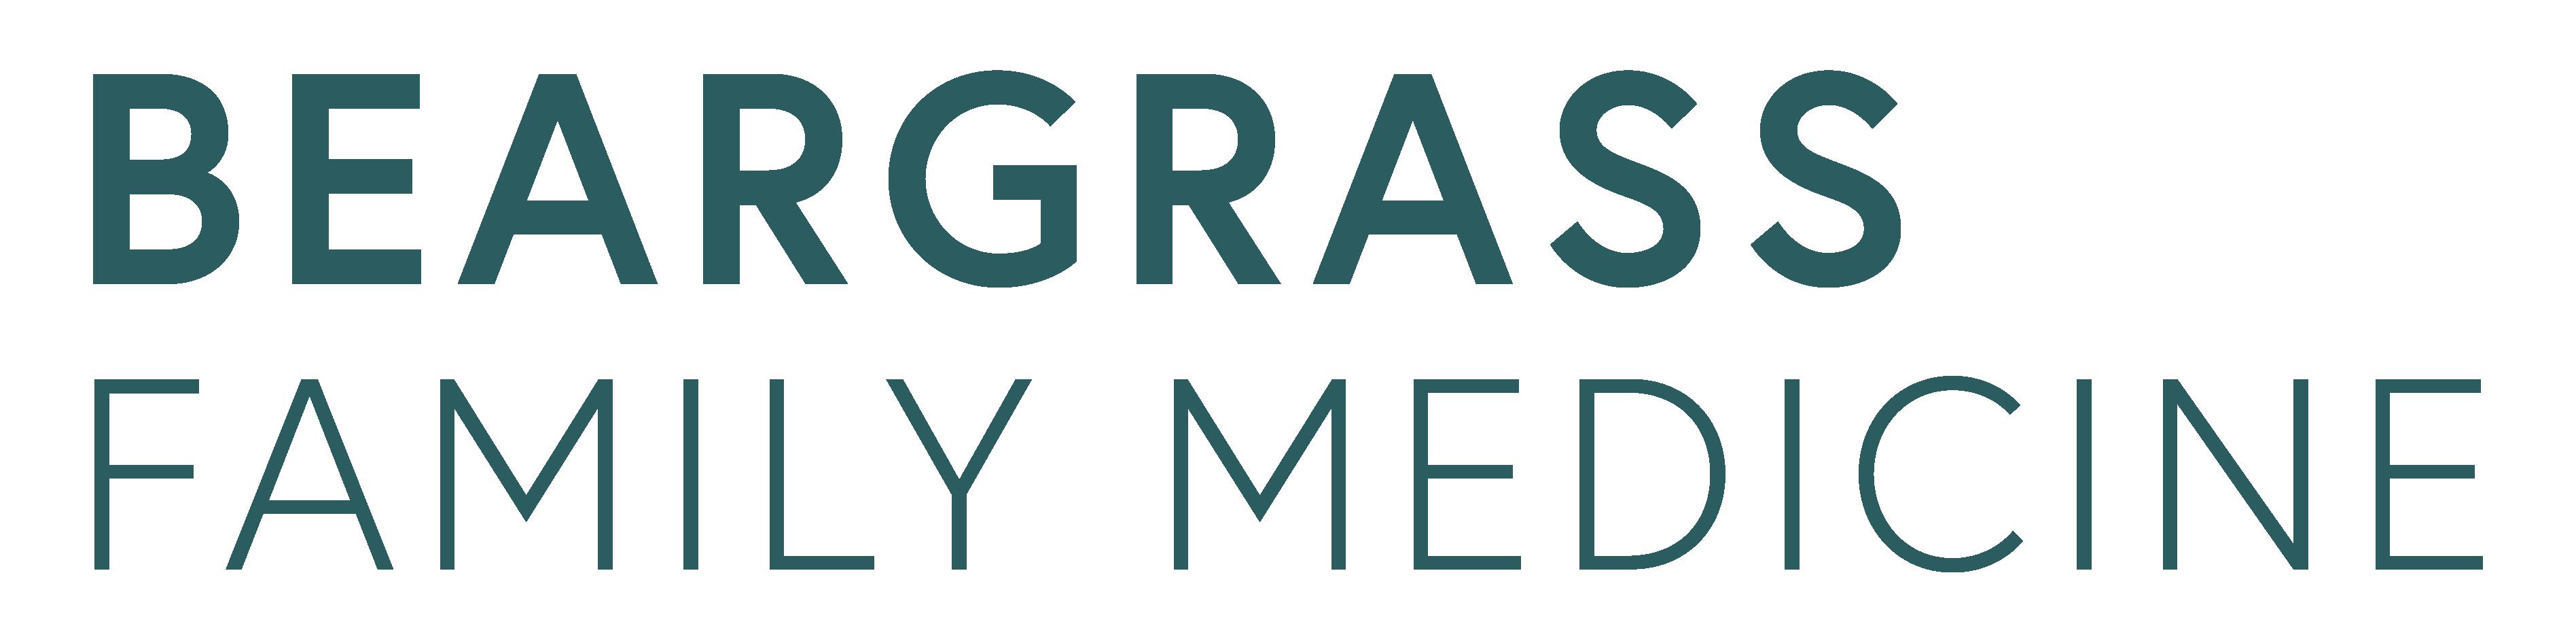 Beargrass Family Medicine